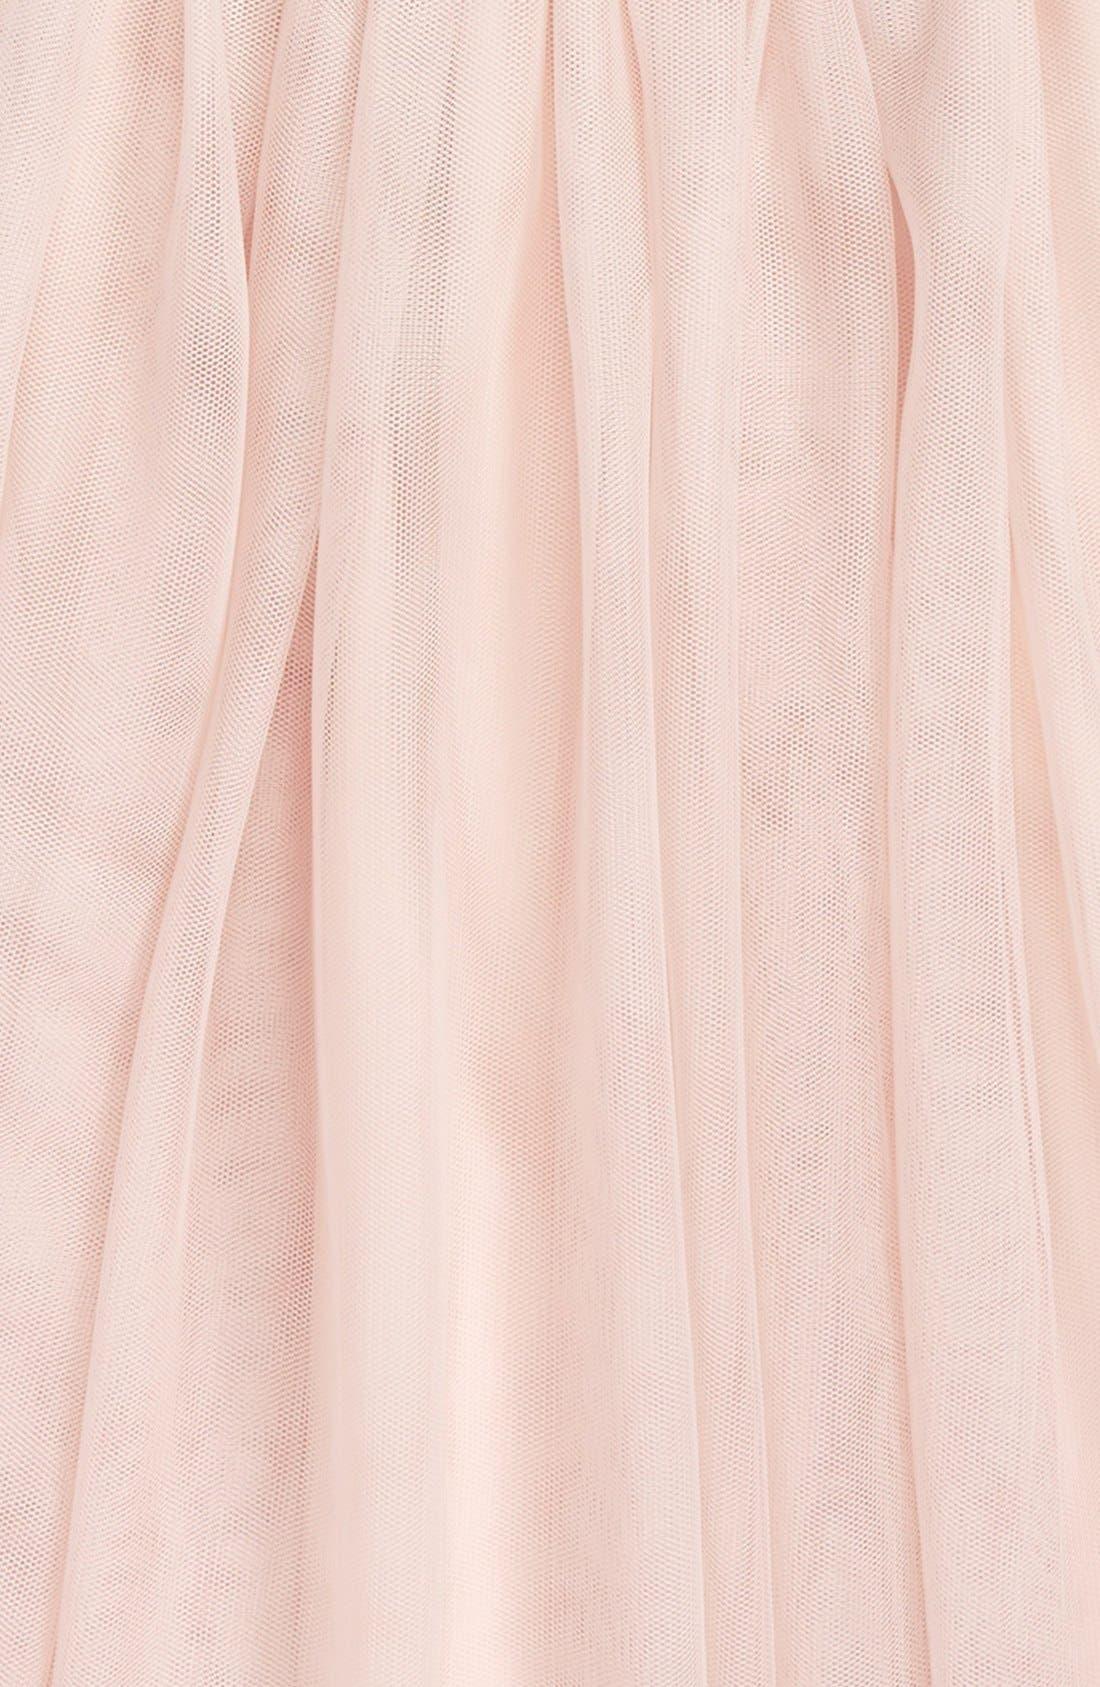 Alternate Image 2  - Zunie Sequin 'Meet & Greet' Top & Tulle Skirt Set (Big Girls)